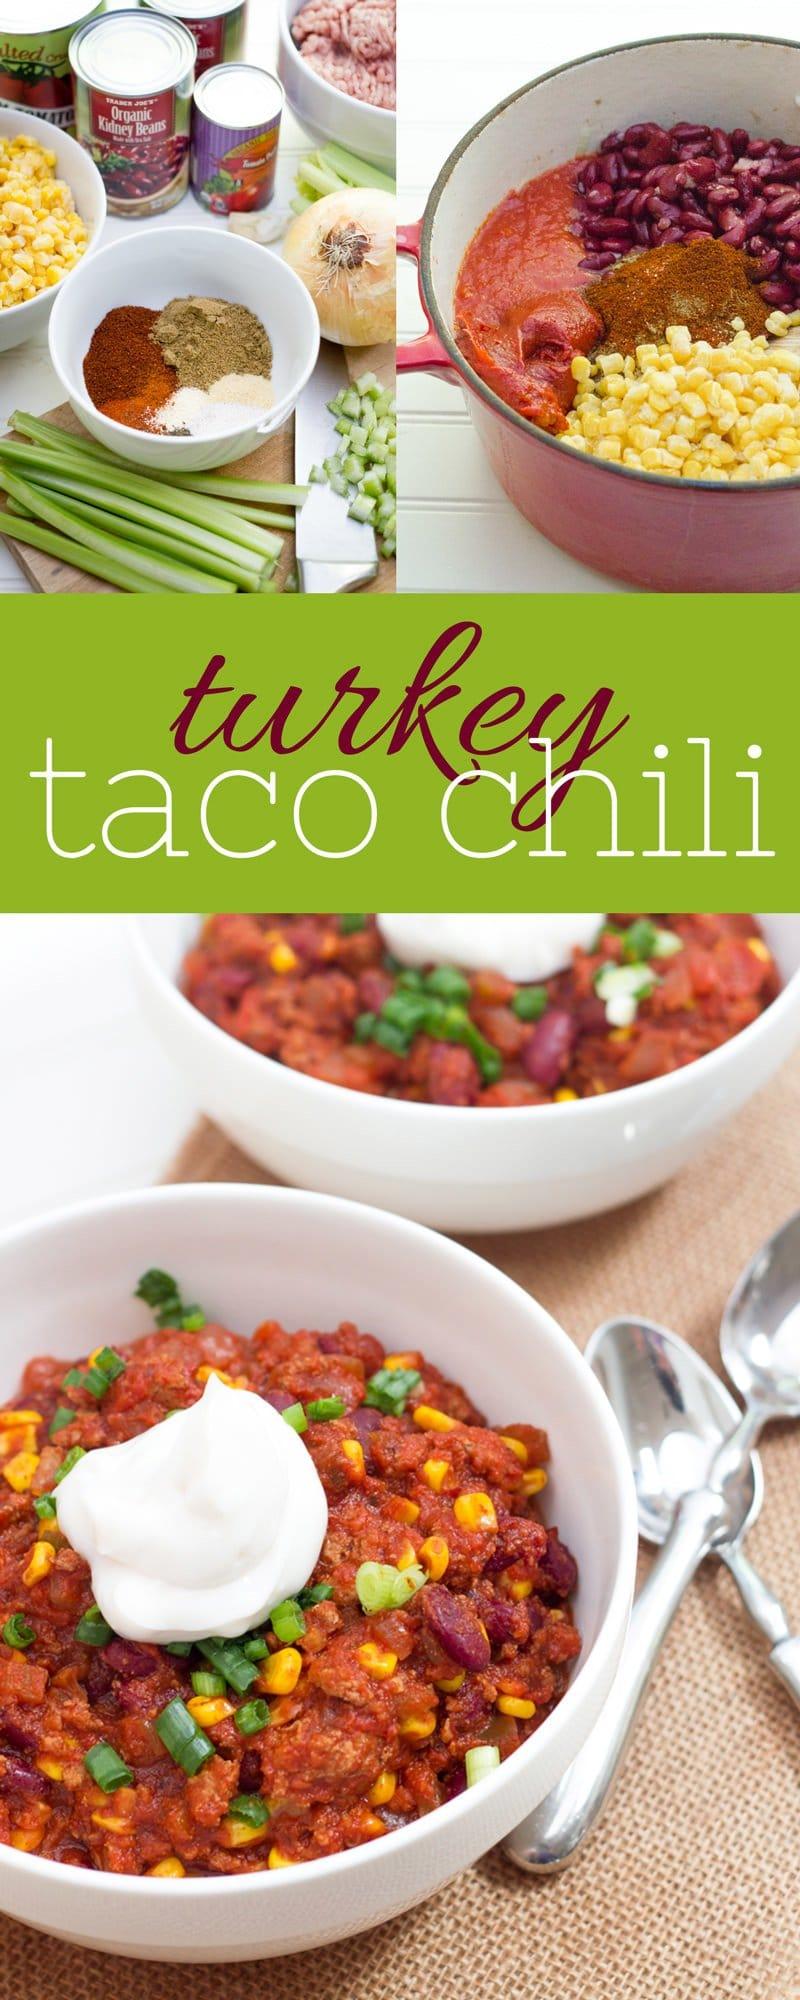 Turkey Taco Chili